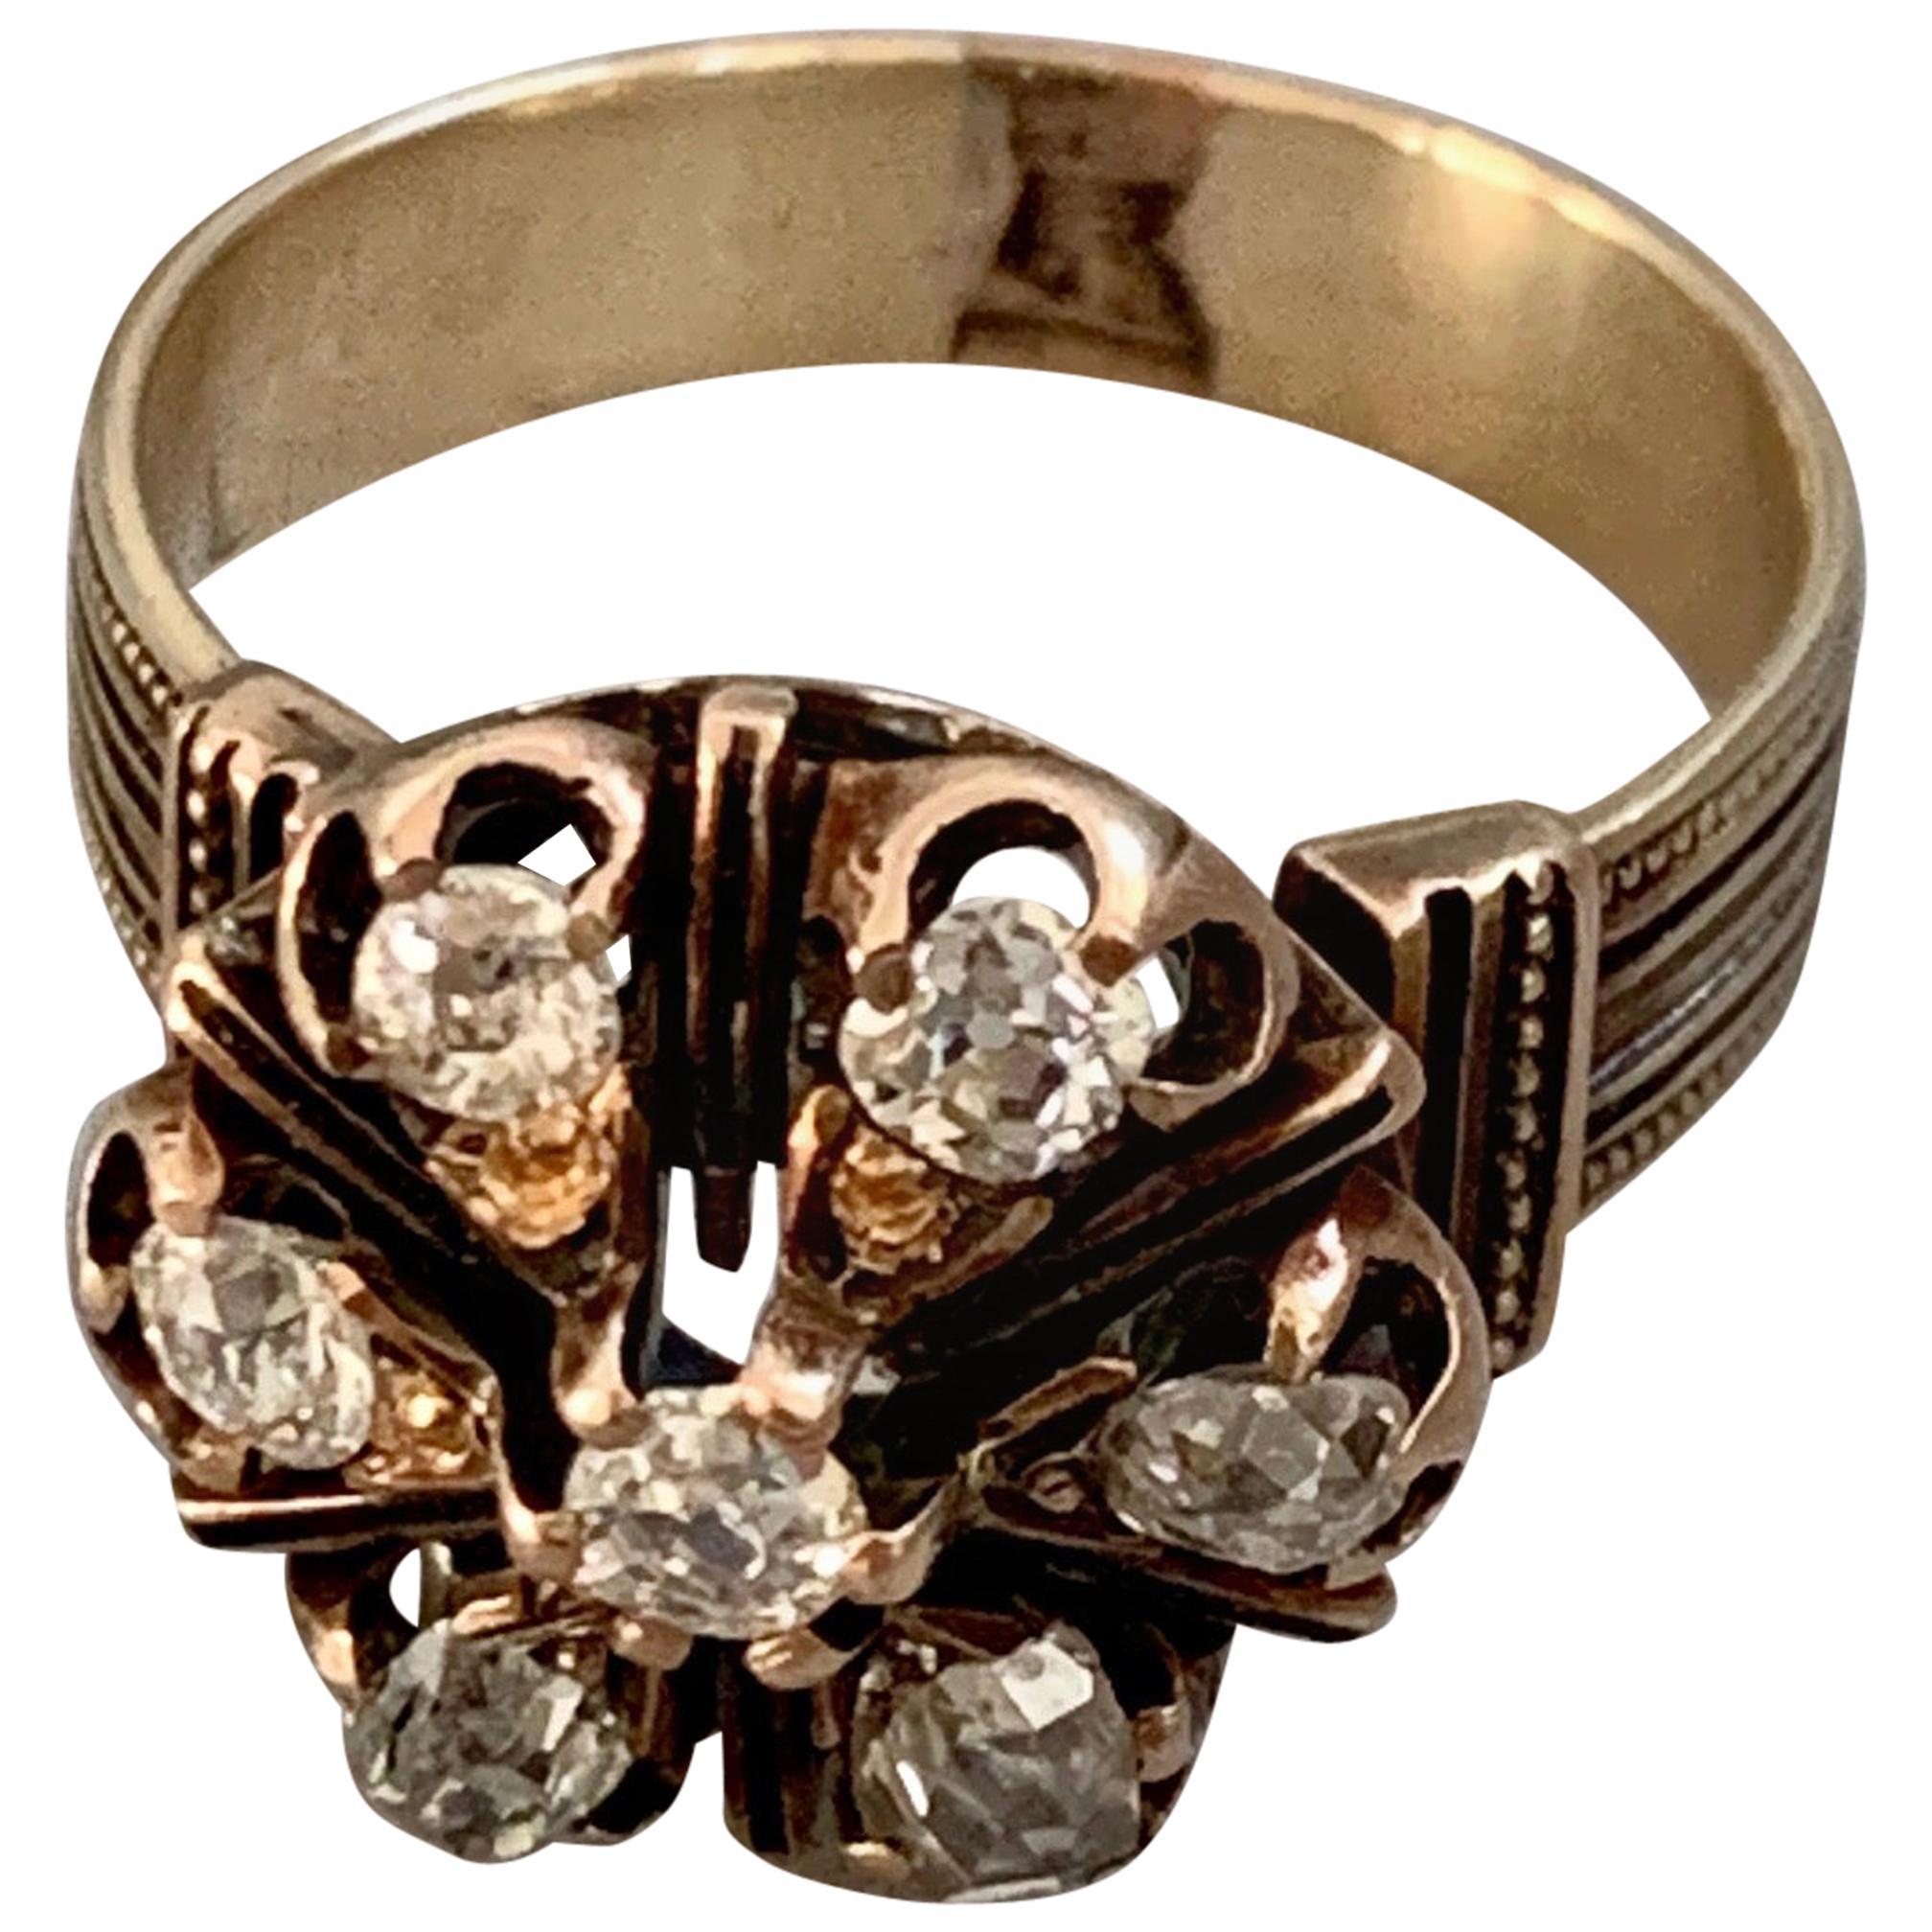 Victorian Euro and Mine Cut Diamond 14 Karat Yellow Gold Ring - Size 7 3/4